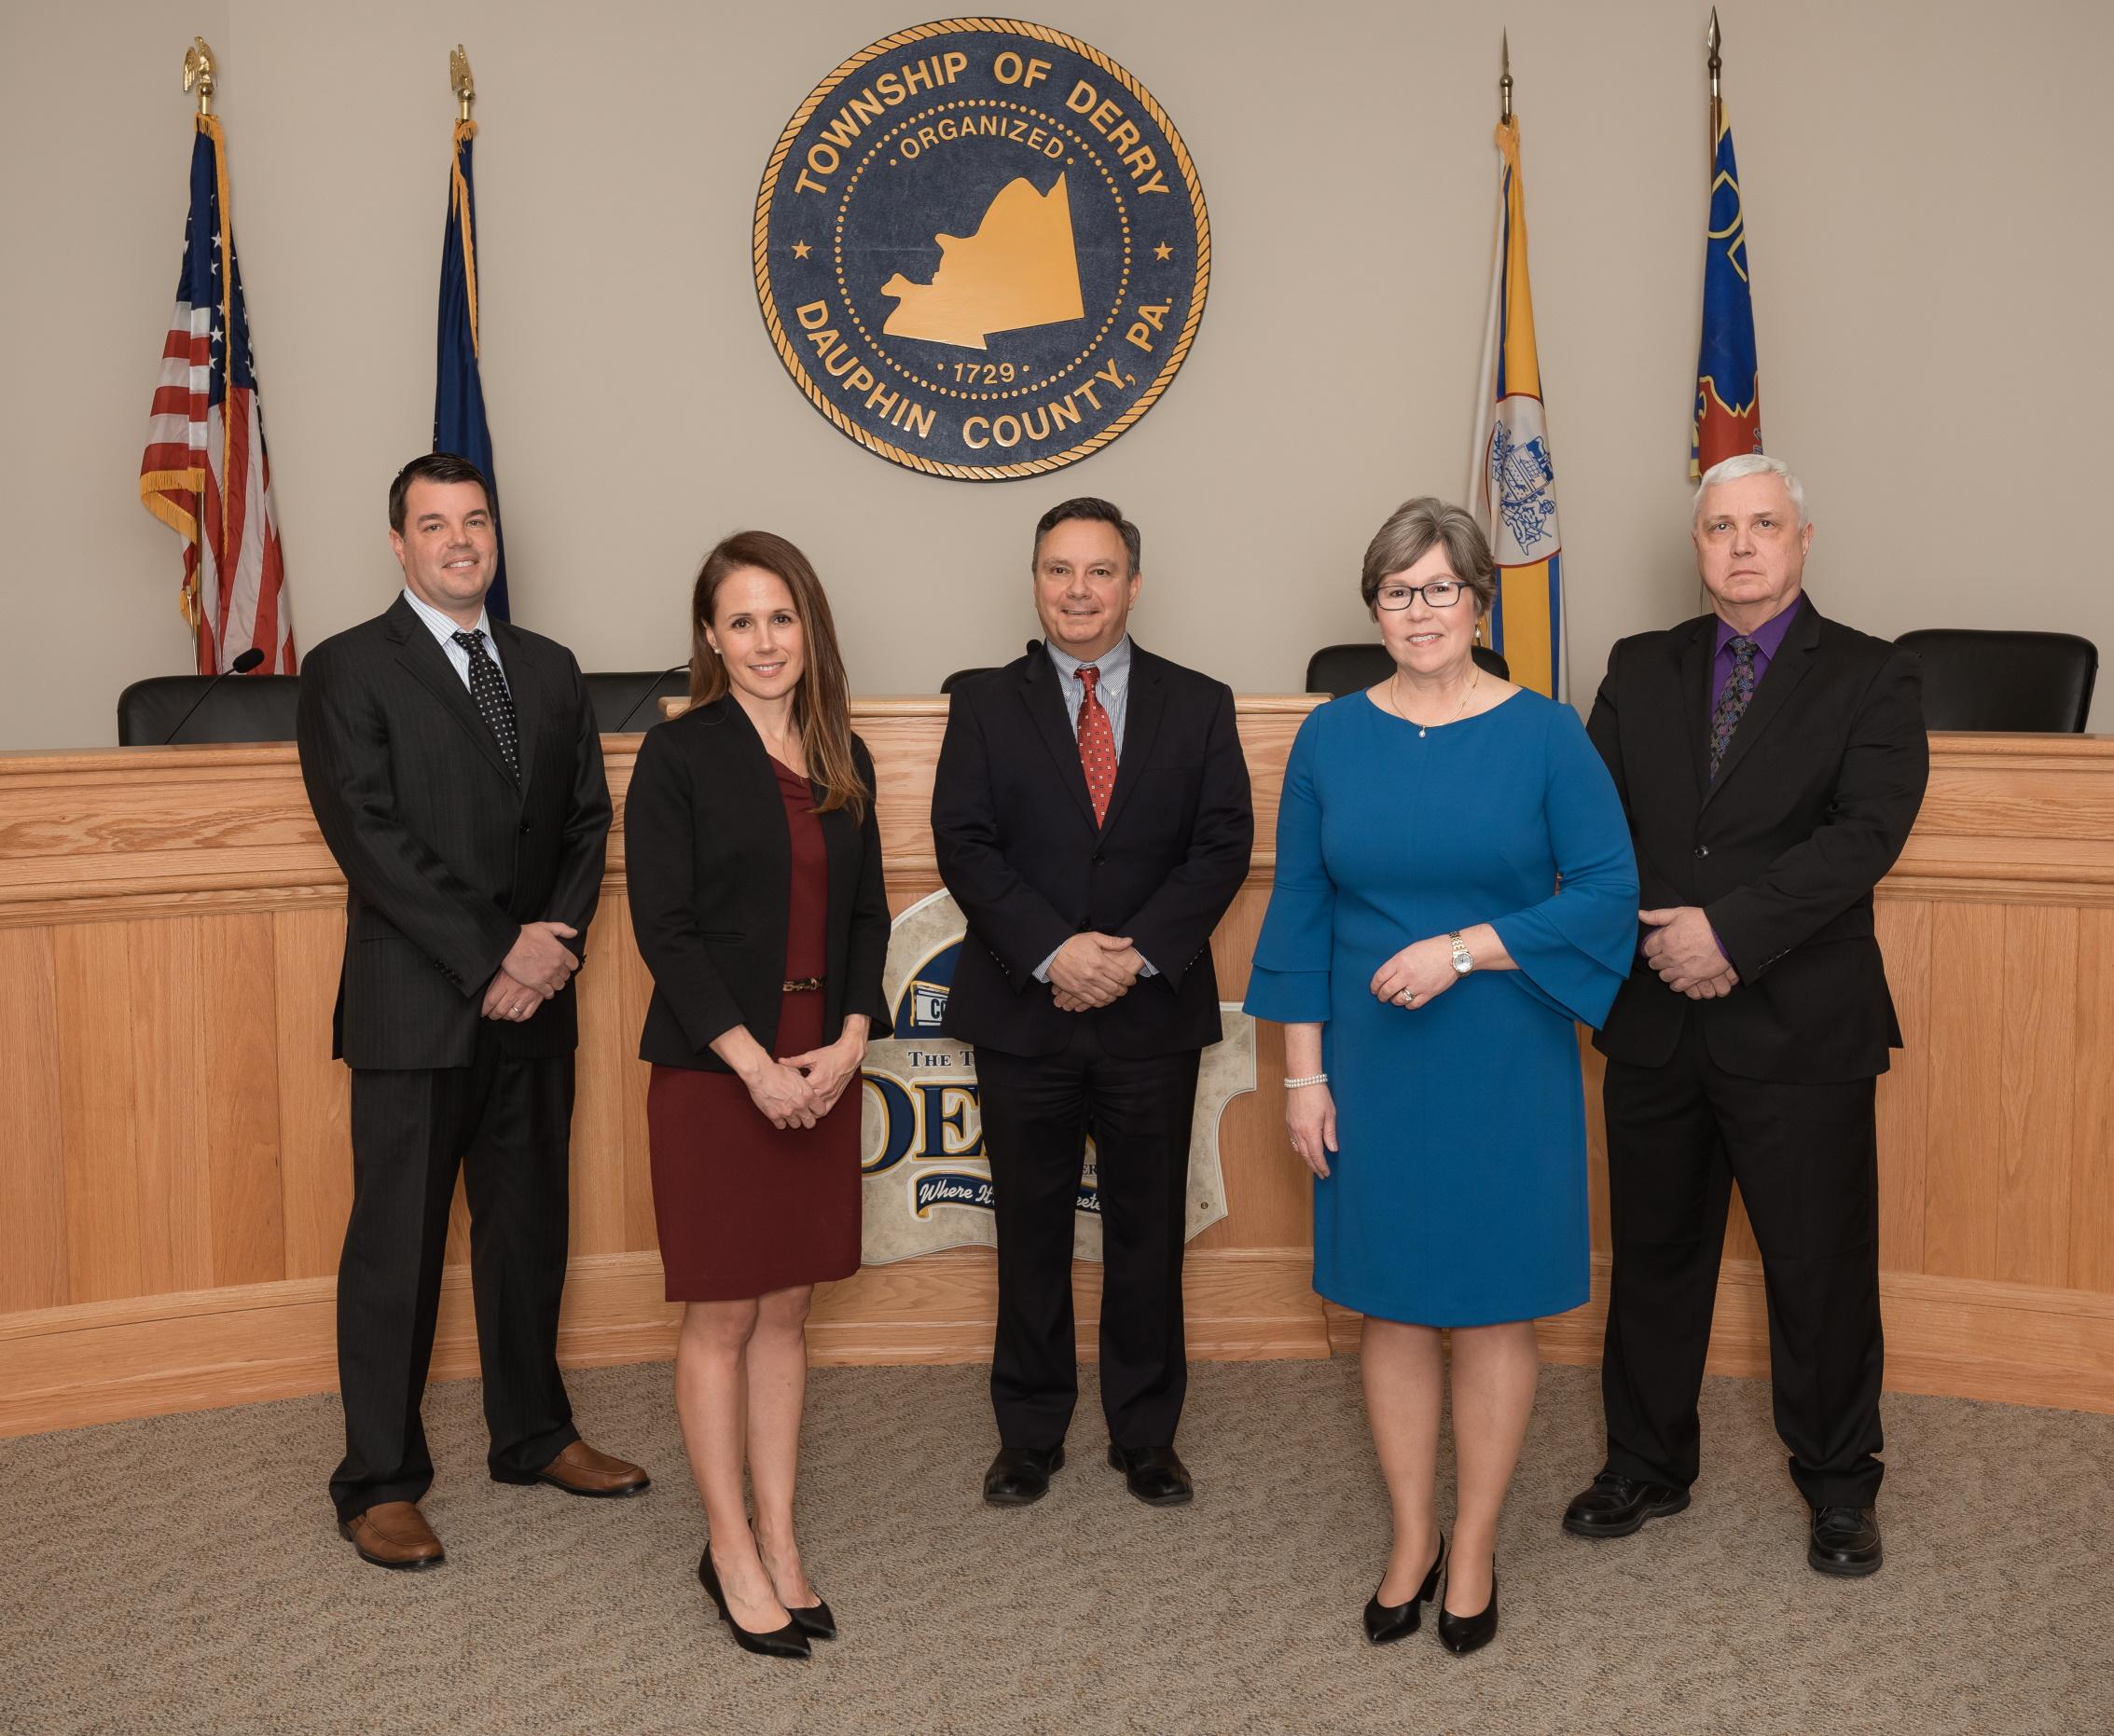 Pictured (l-r): Carter Wyckoff, Natalie Nutt, Chris Abruzzo, Susan Cort, Rick Zmuda